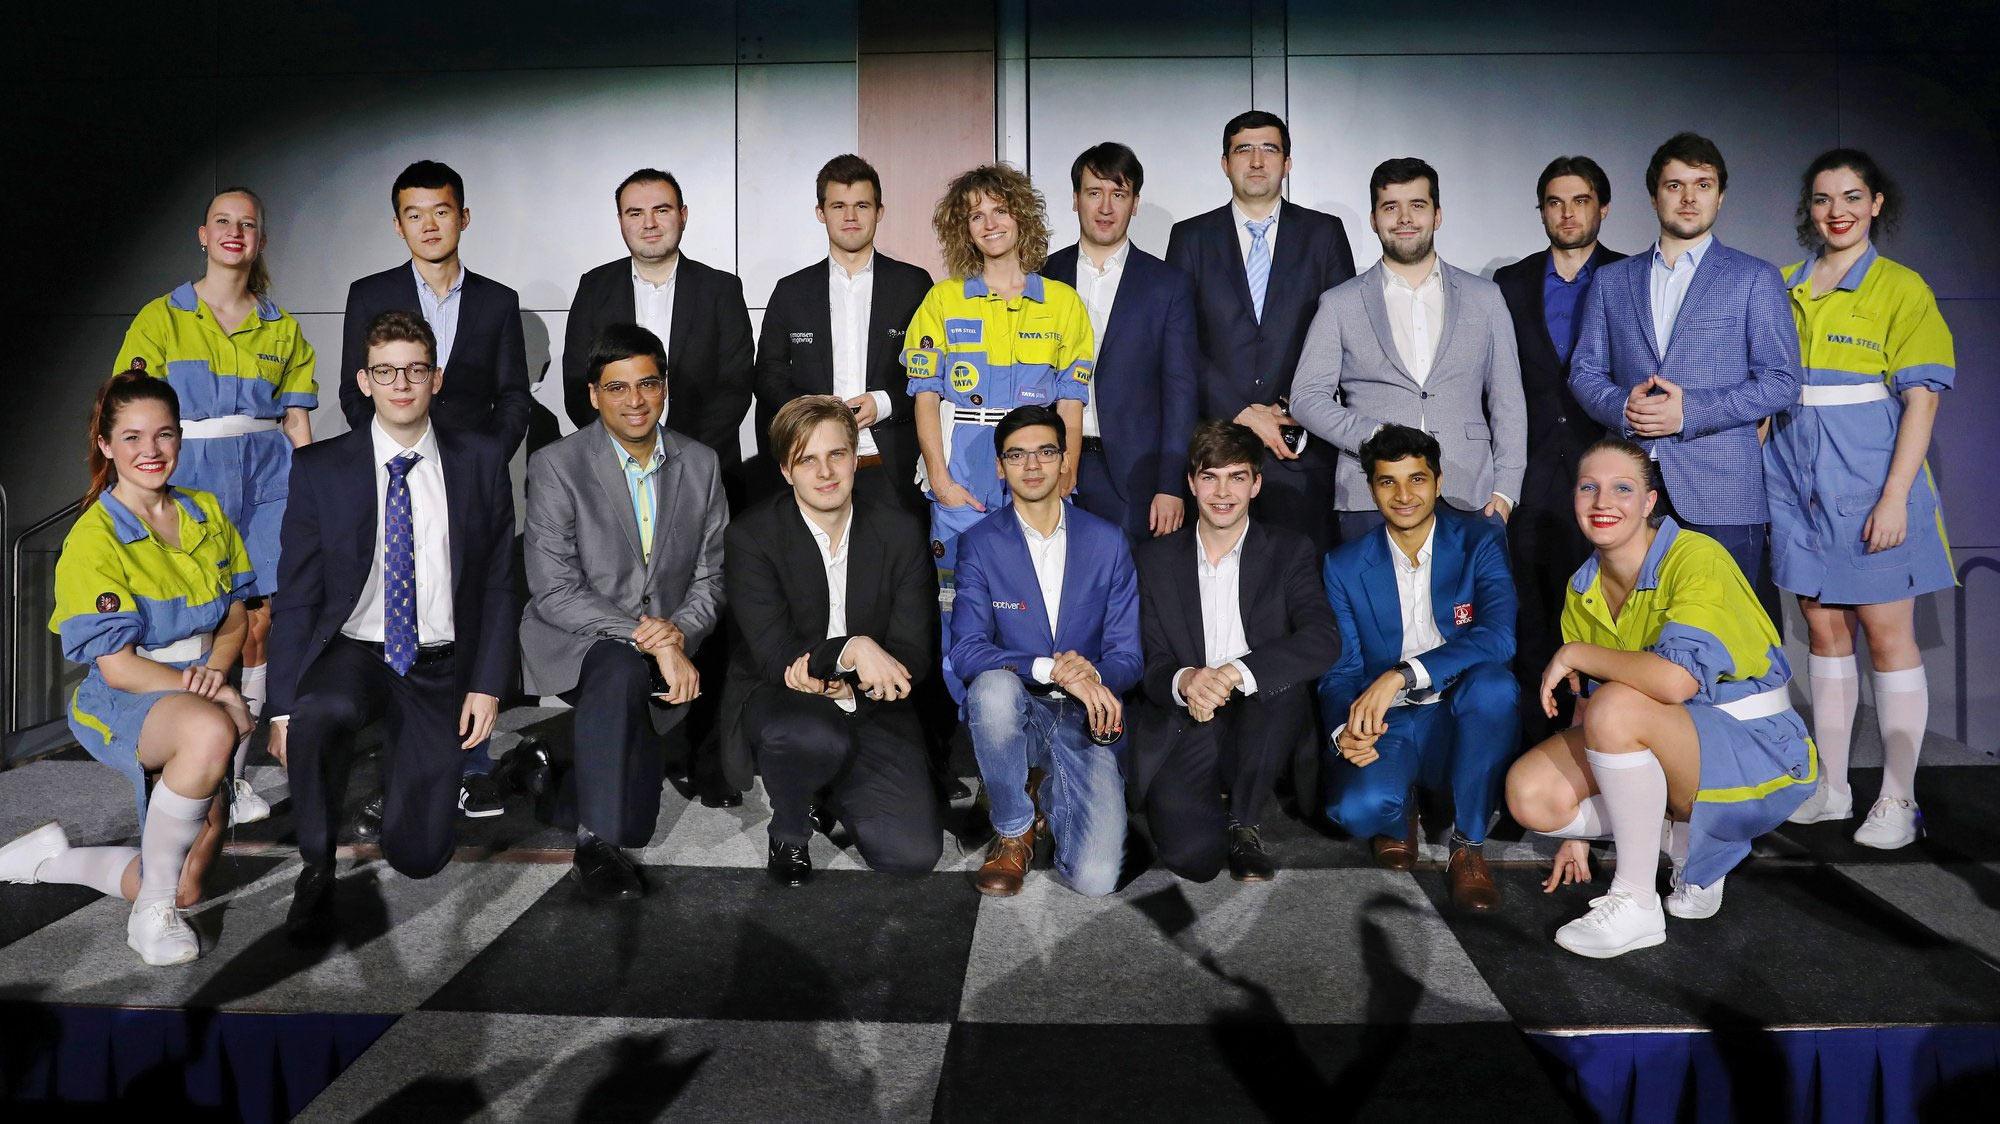 Участники турнира Tata Steel Masters 2019 с представительницами спонсора